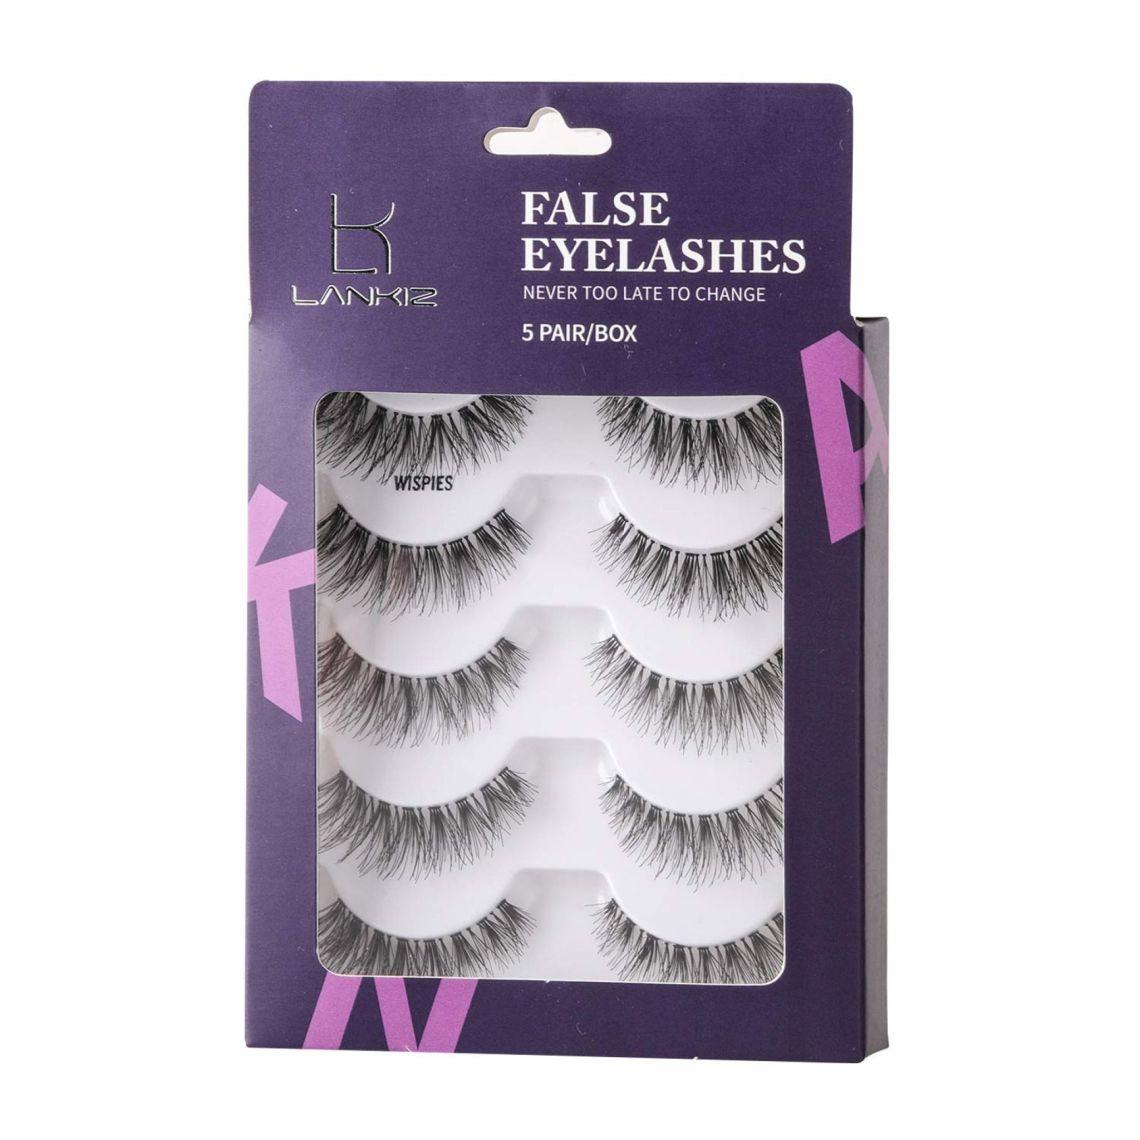 Amazon.com : 5 Pairs 3D False Eyelashes Flexible Demi Wispies False Lashes Reusable Handmade Cross Fake Eye Lashes for Makeup Natural Looking Black Eyelashes LK LANKIZ (WISPIES) : Beauty